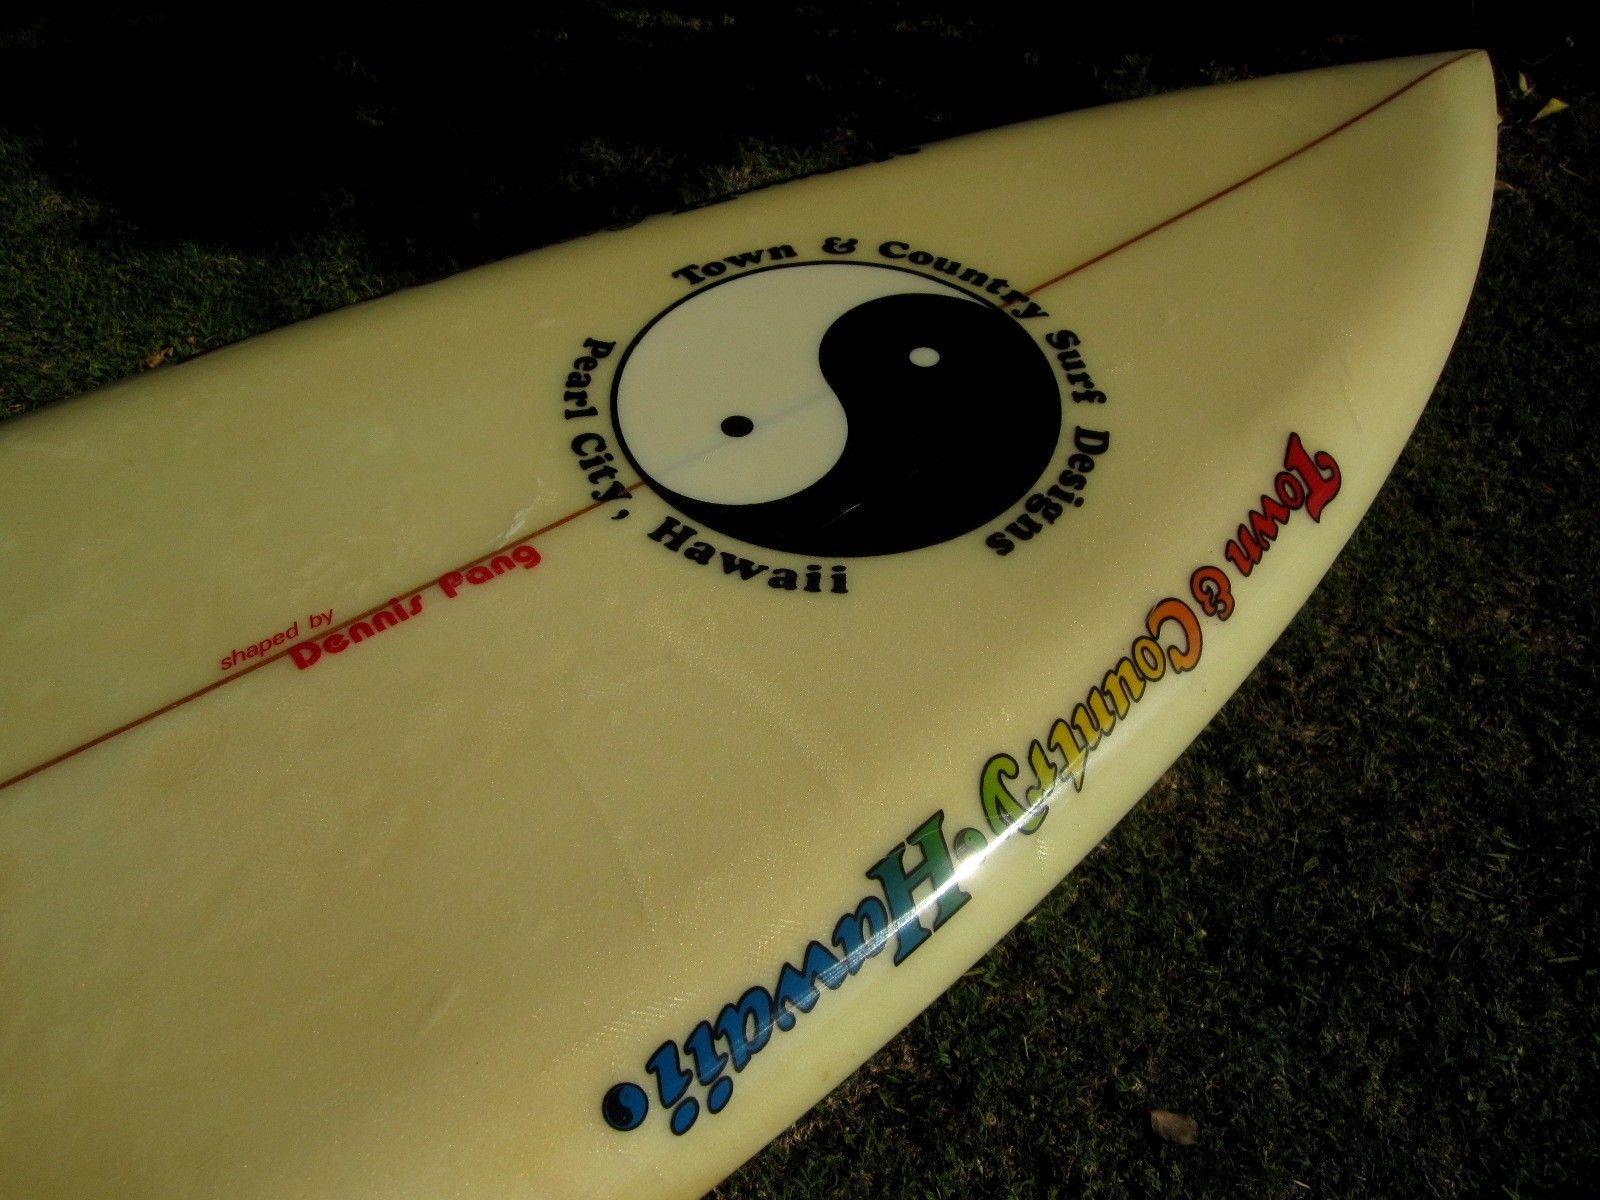 T&C Dennis Pang Single Fin 5'9 9